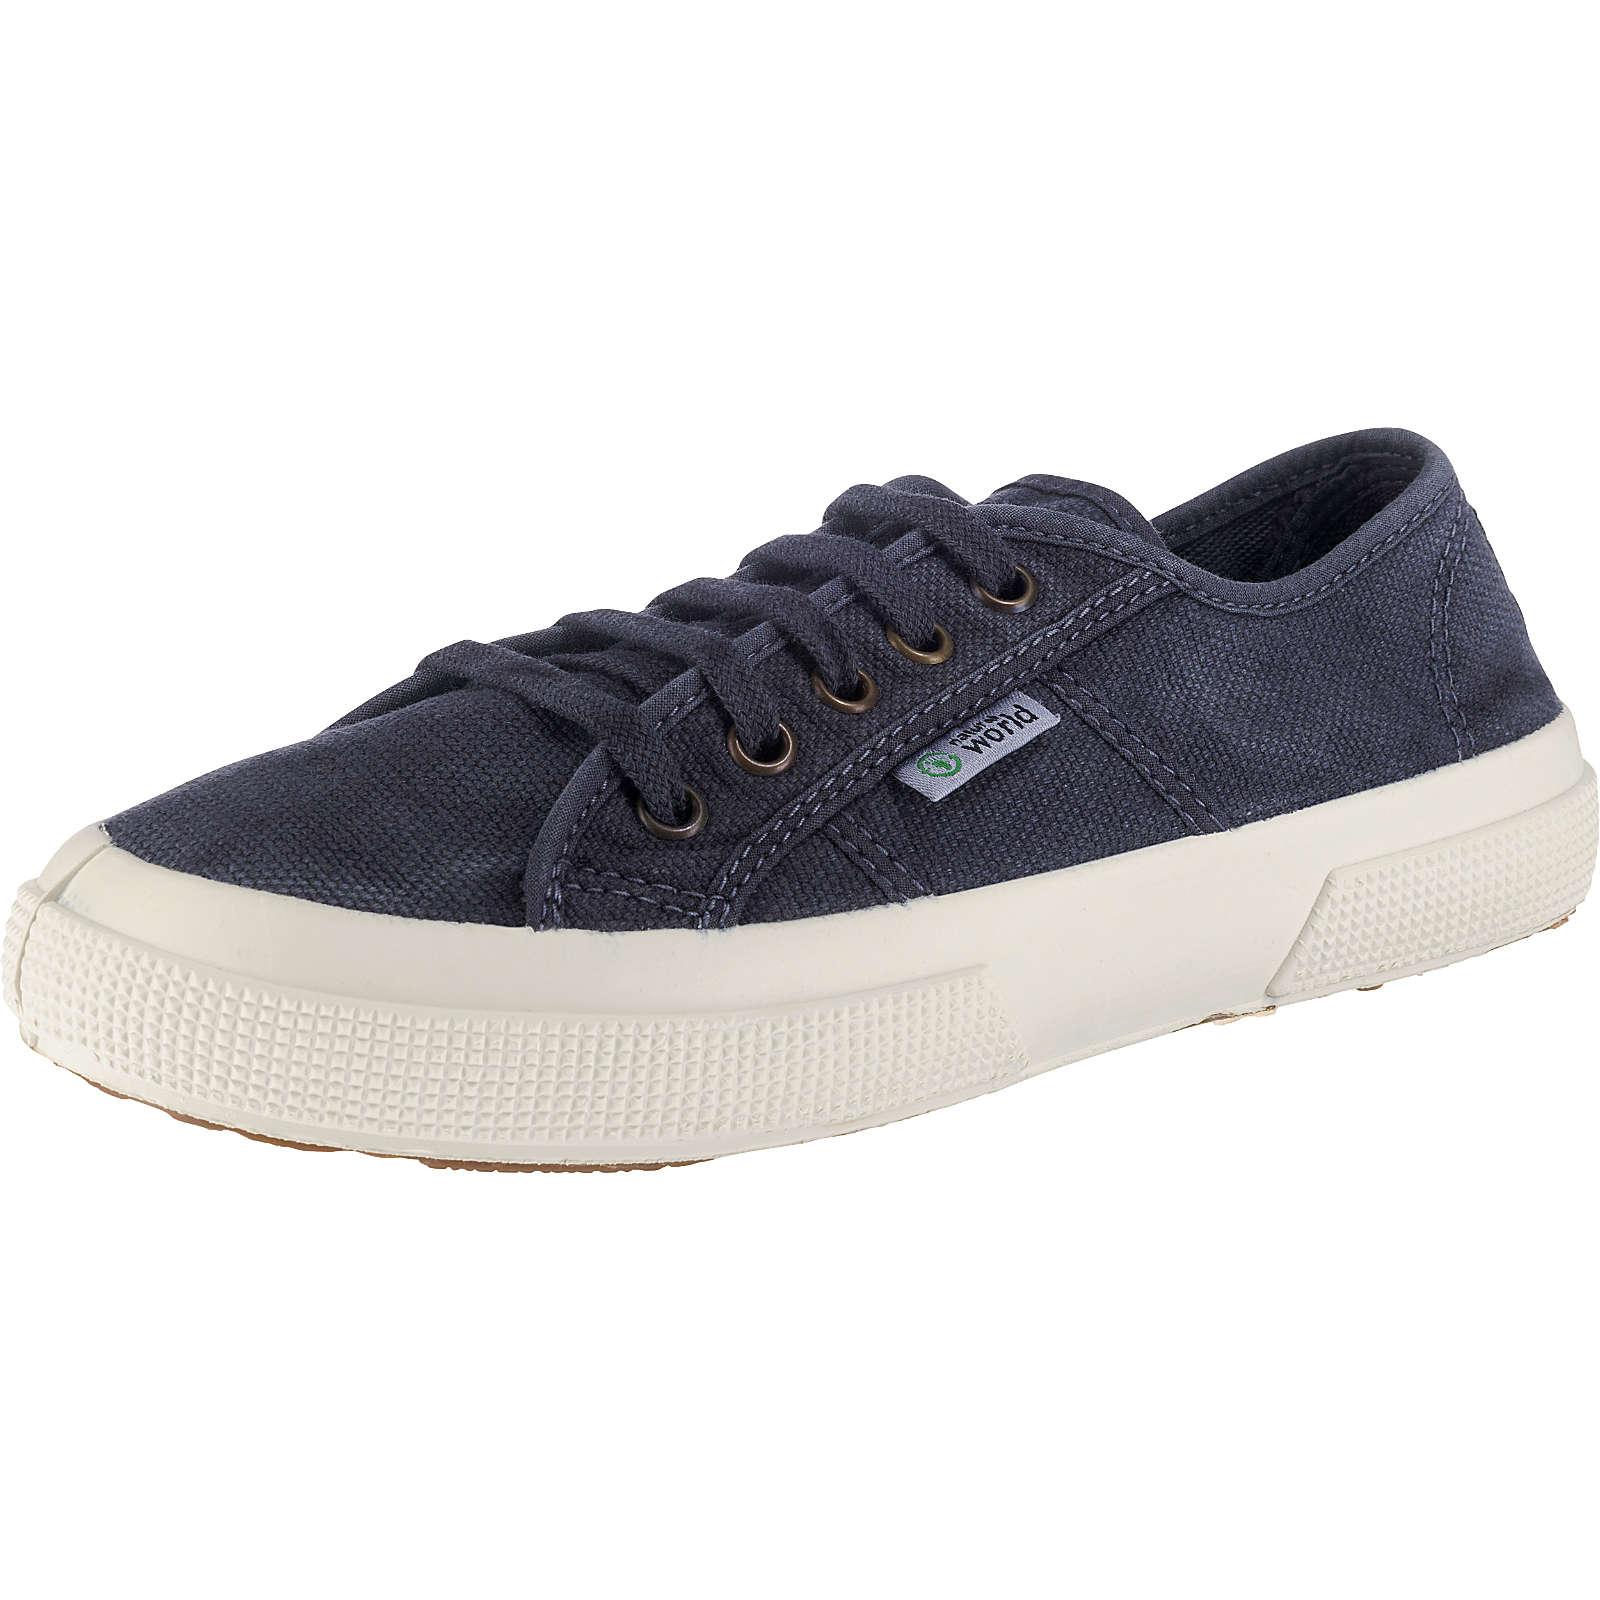 natural world BASQUET ENZIMATICO Sneakers Low blau Damen Gr. 37